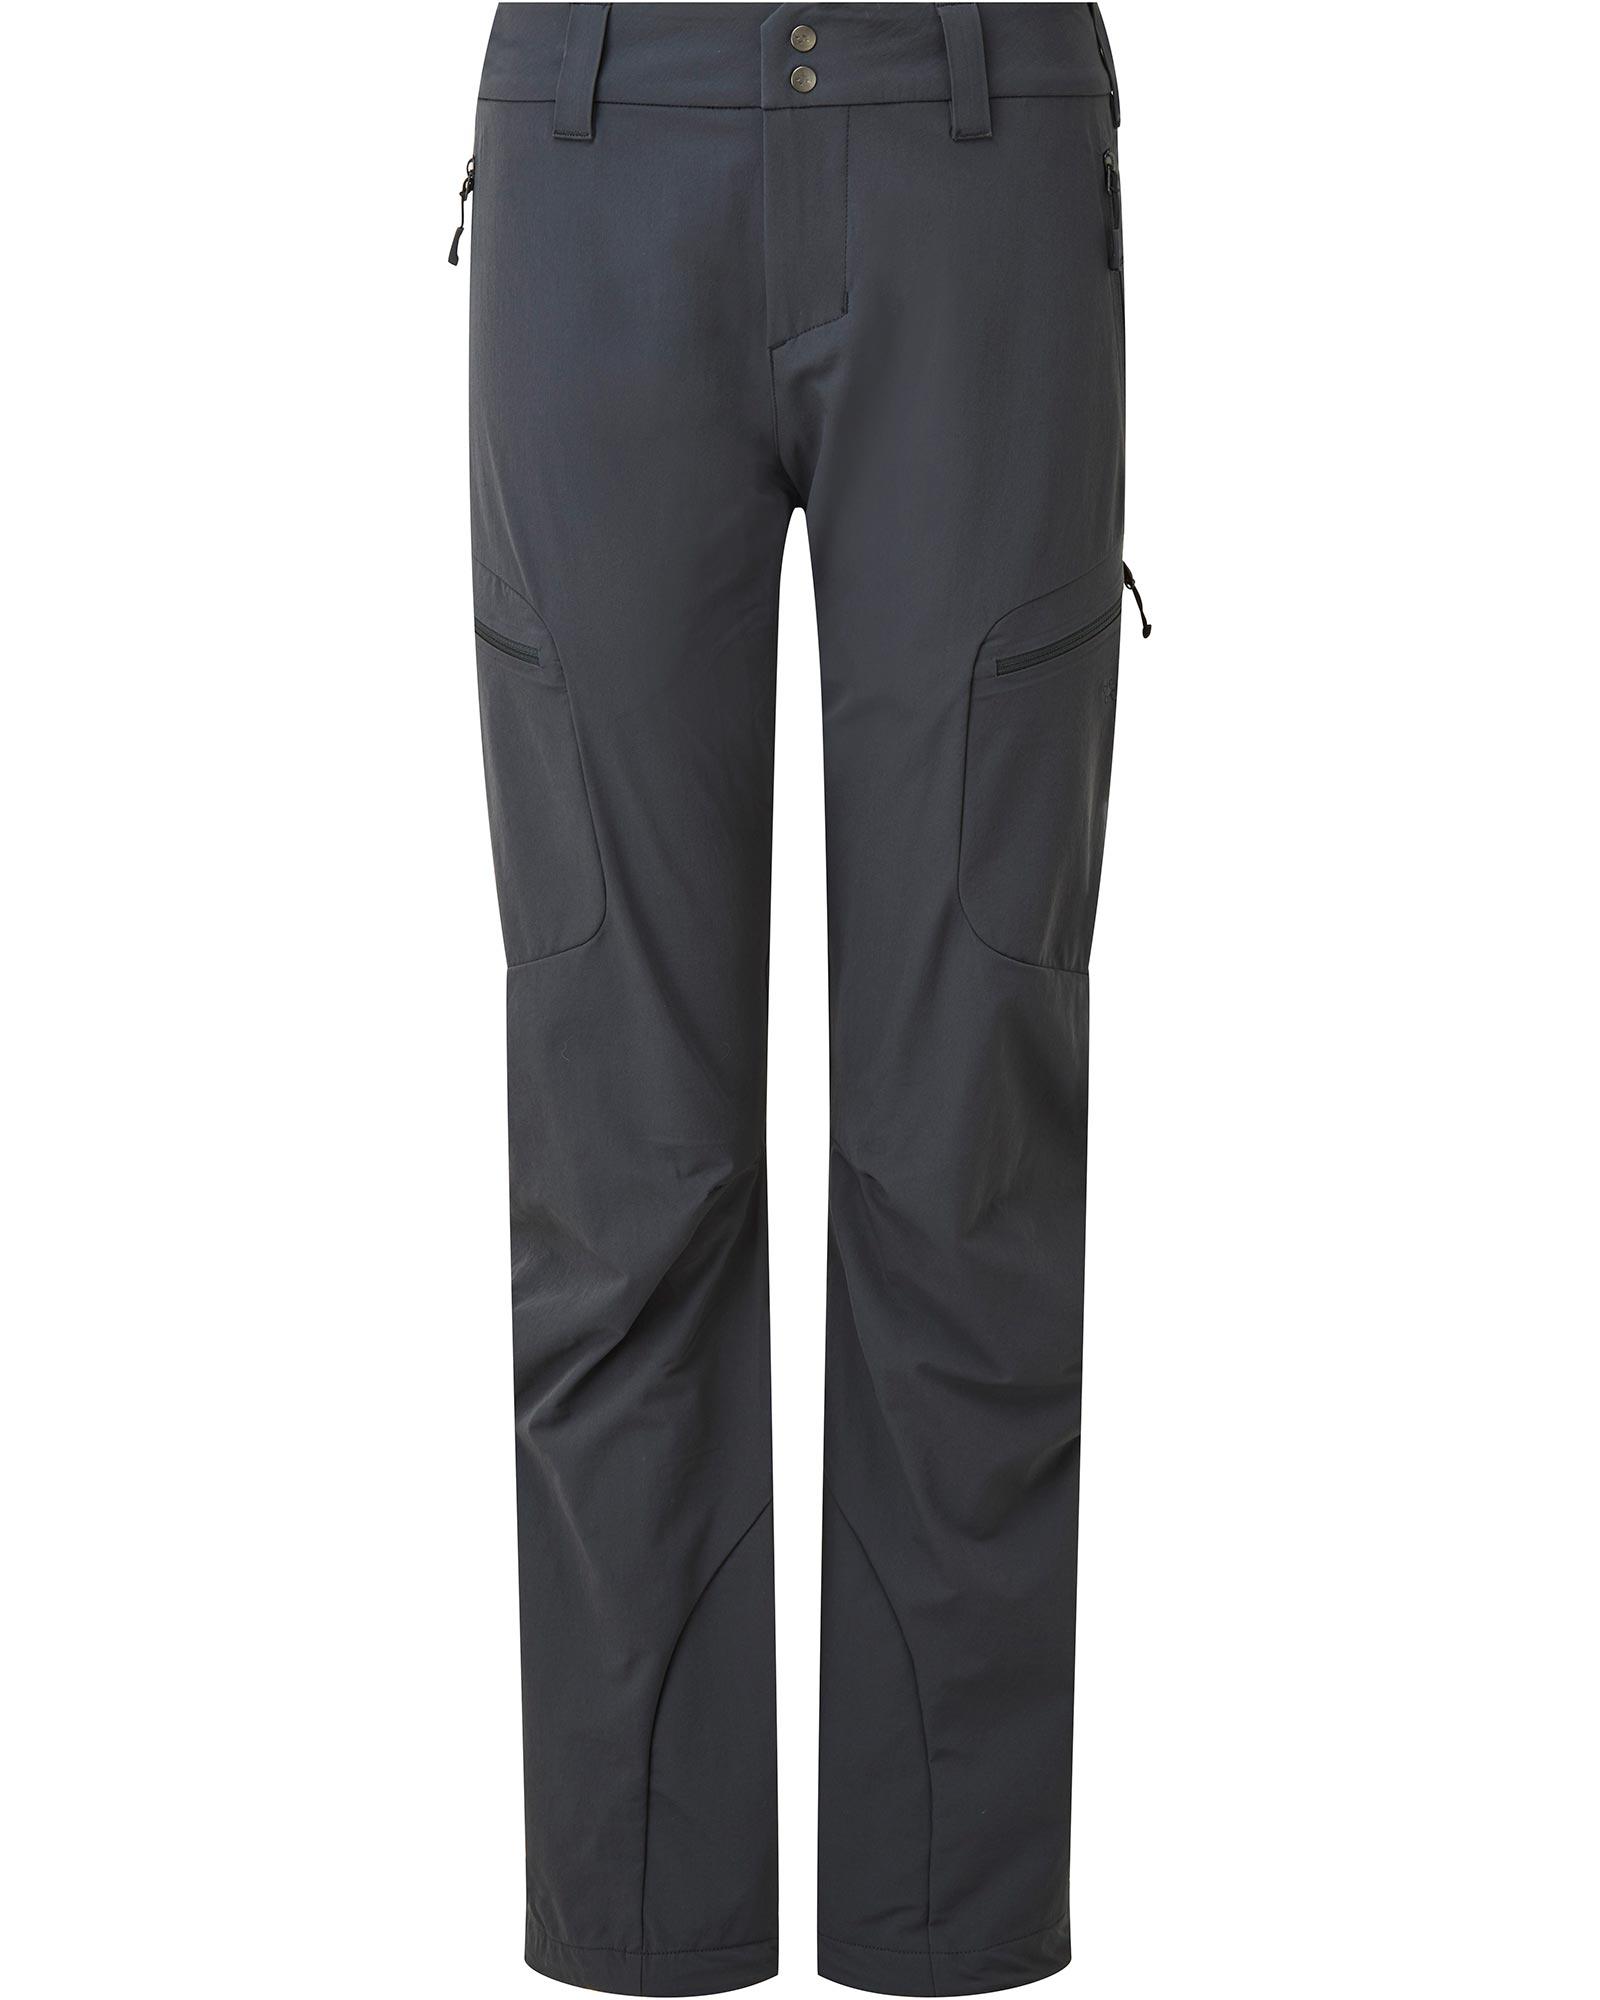 Rab Sawtooth Women's Pants Short Leg 0